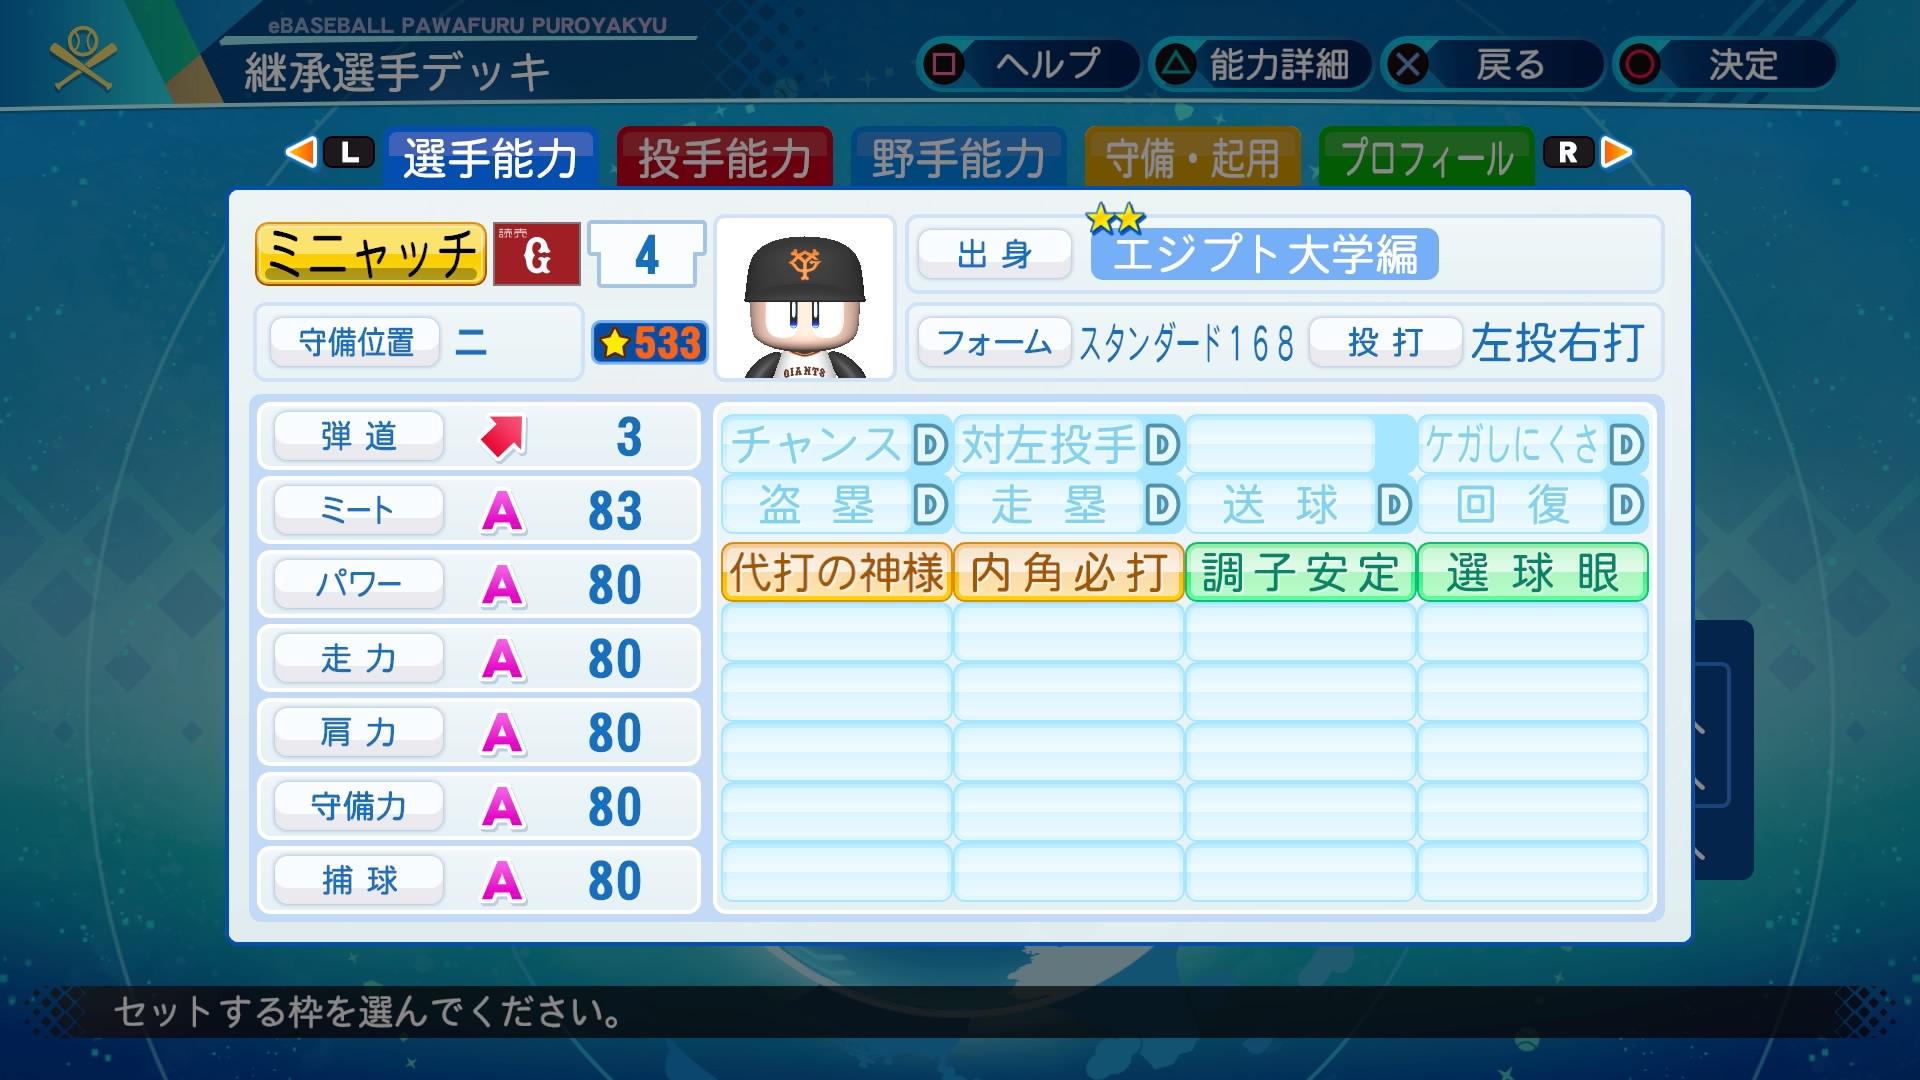 EdN8_mcU0AEFqU8.jpg